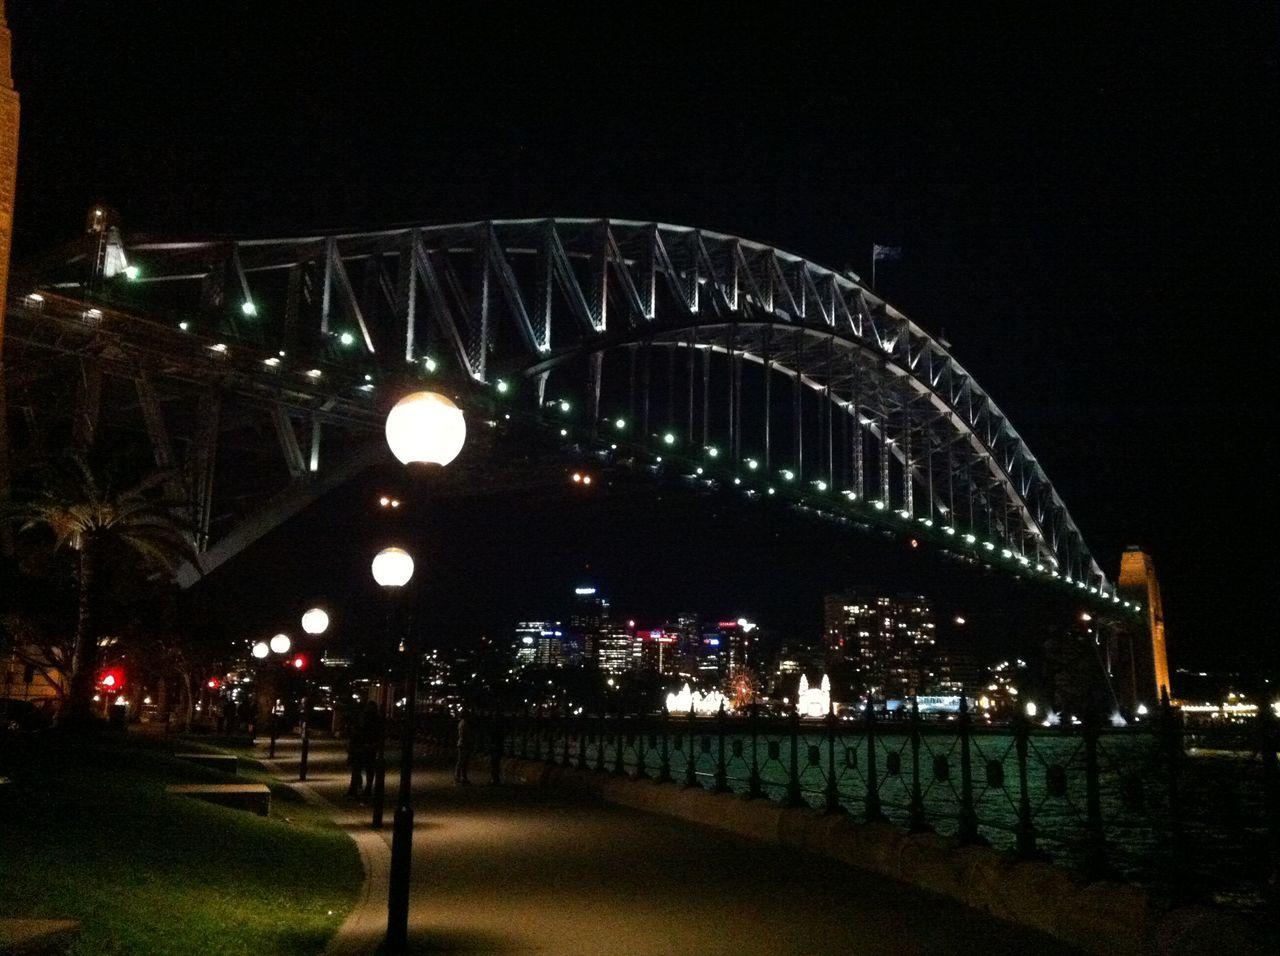 The Coat Hanger Sydney, Australia 2012 Architecture Bridge - Man Made Structure Business Finance And Industry Harbor Bridge Illuminated Midnight Night No People Outdoors Sky The Coat Hanger